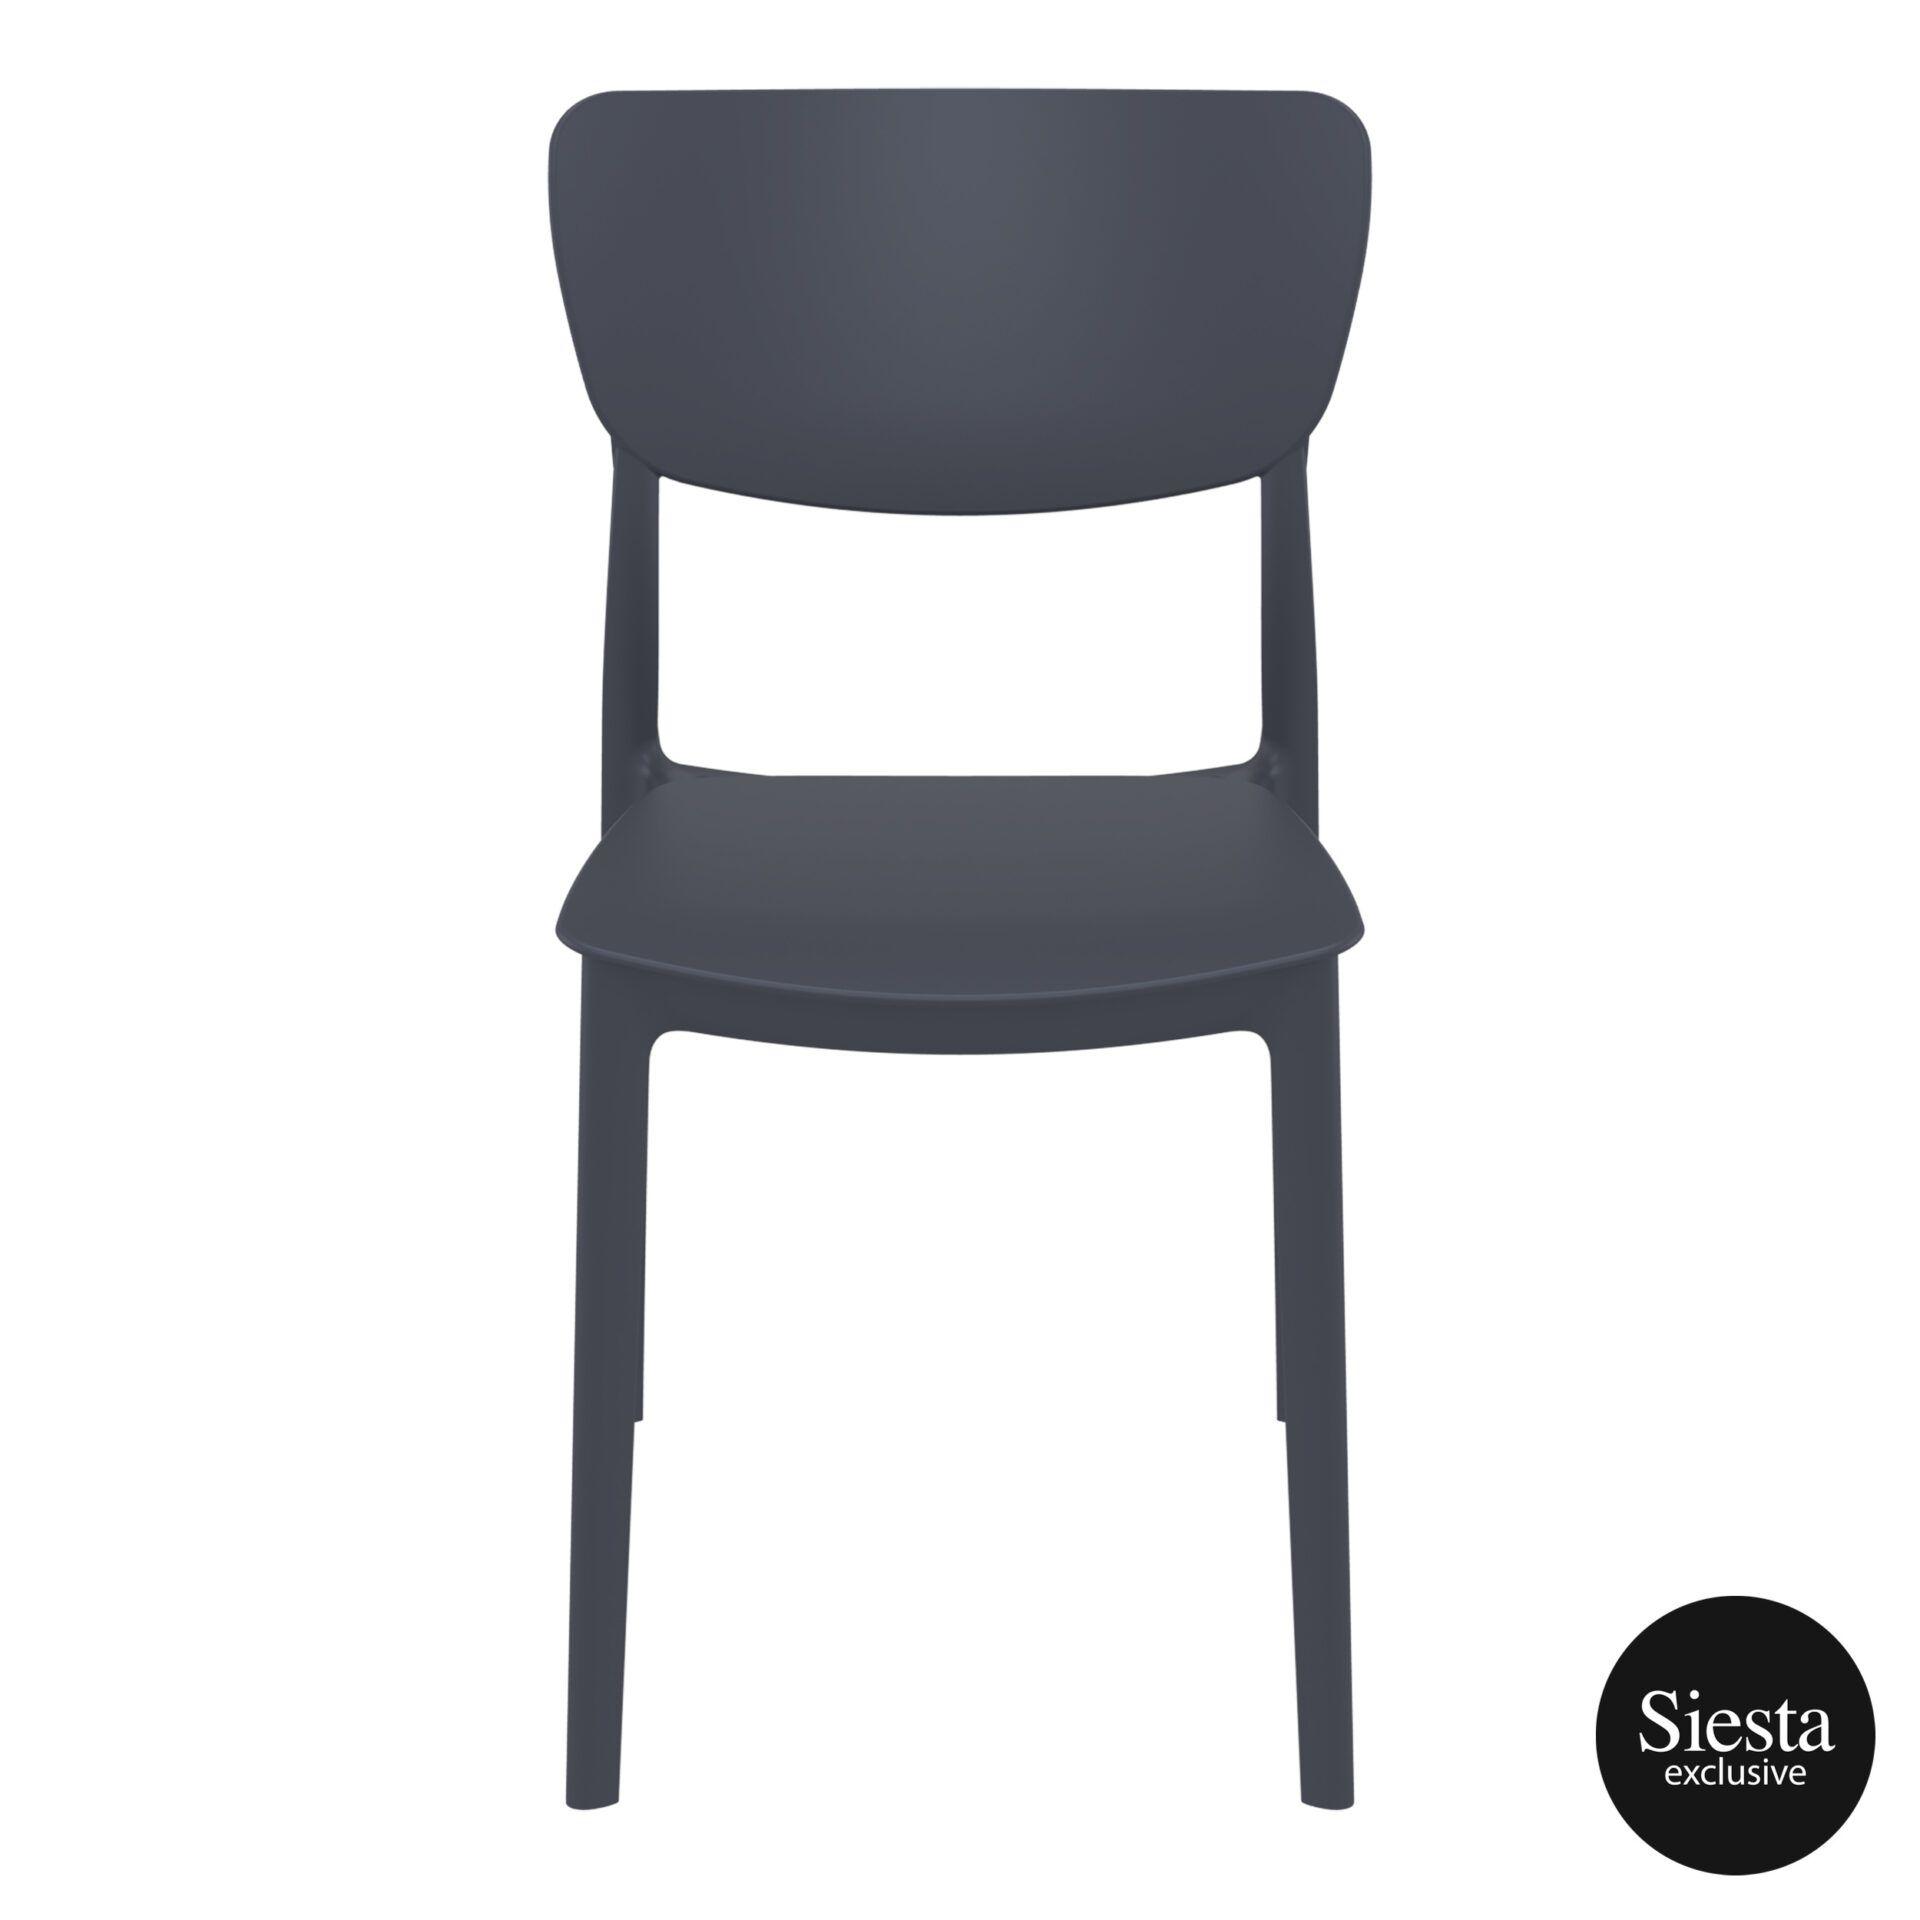 polypropylene outdoor dining monna chair darkgrey front 2